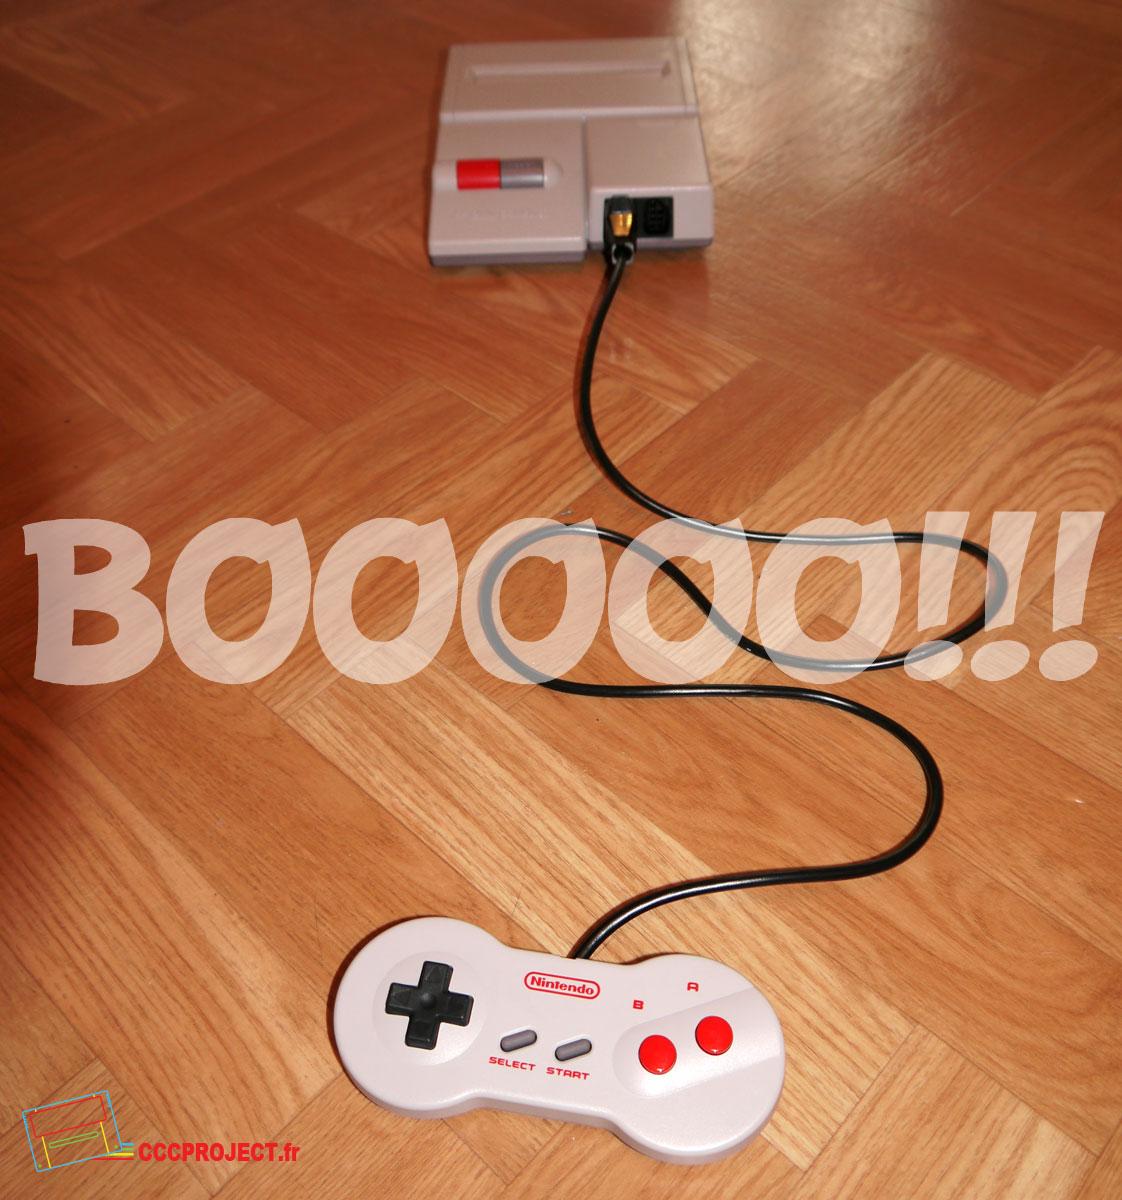 Rallonge Maison Pour Pads Dogbone Famicom Av Feel My